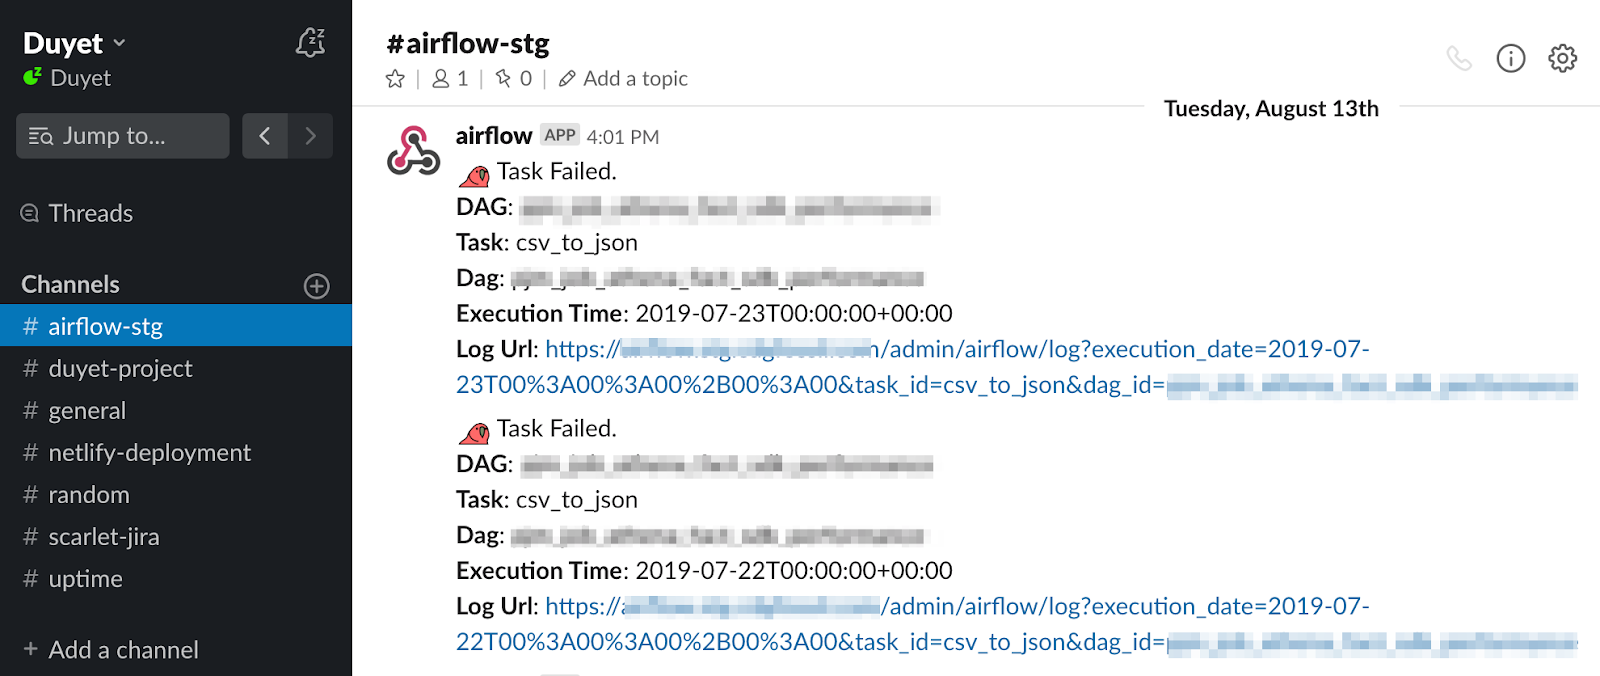 Gửi Slack Alerts trên Airflow